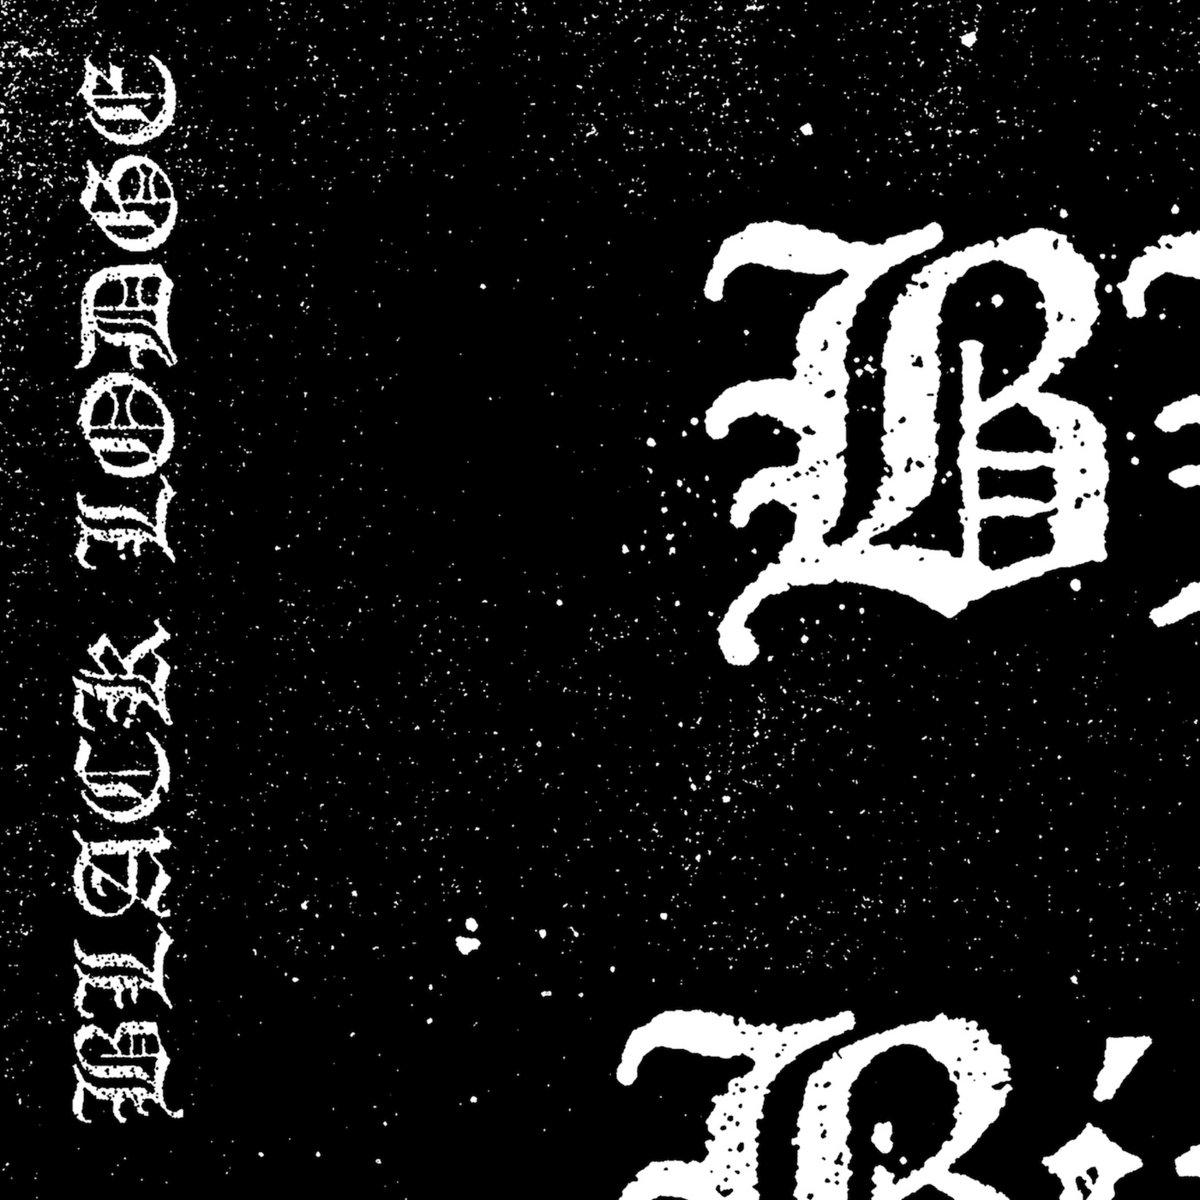 Kings Arms Sessions Vol 3: Lodgewars | Black Lodge